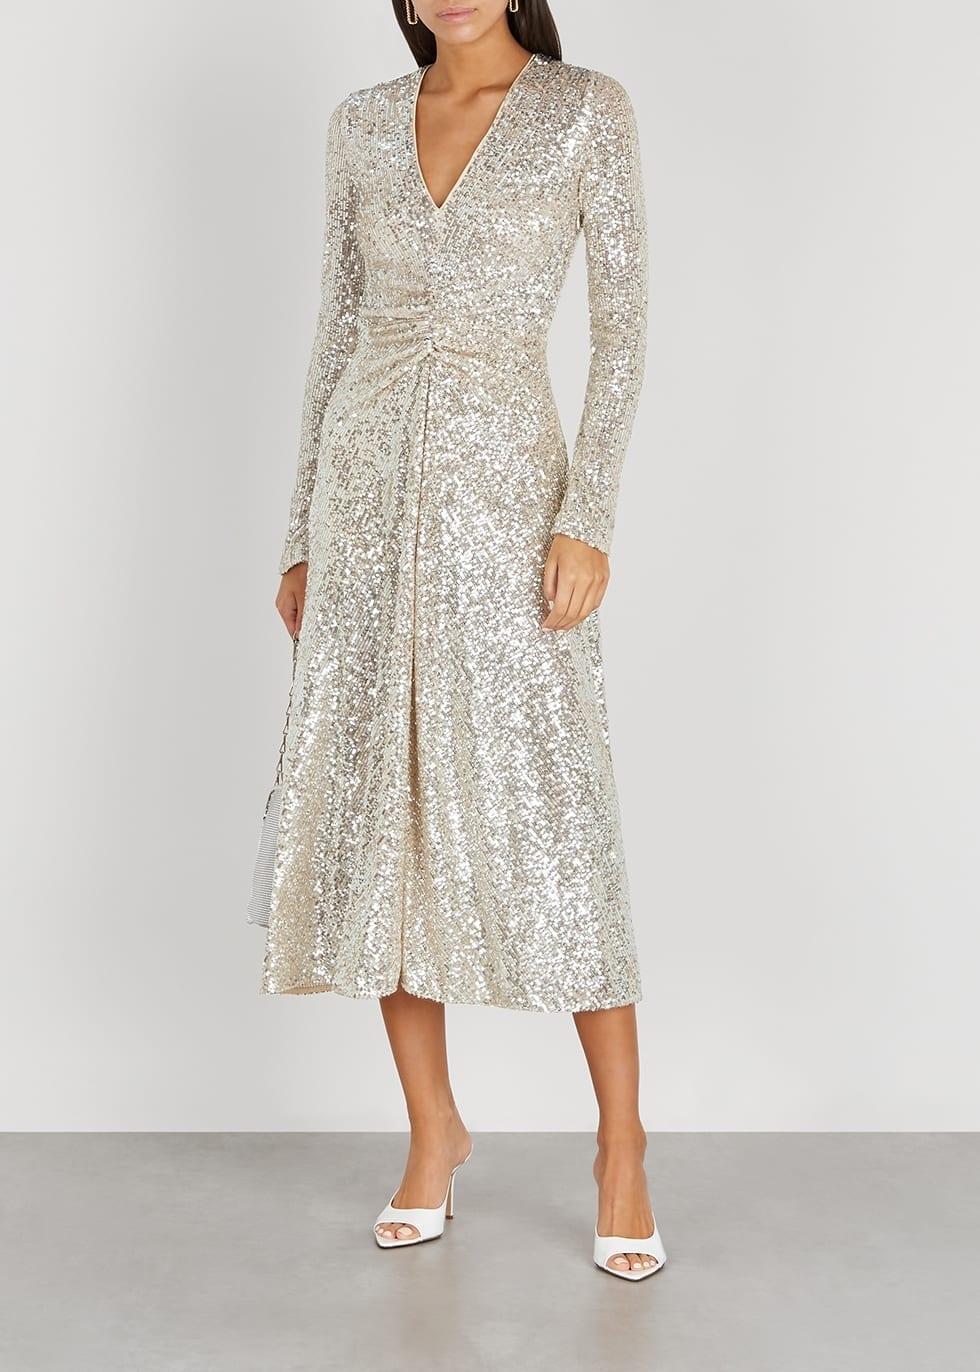 ROTATE BIRGER CHRISTENSEN Sierra Sequinned Stretch-tulle Midi Dress